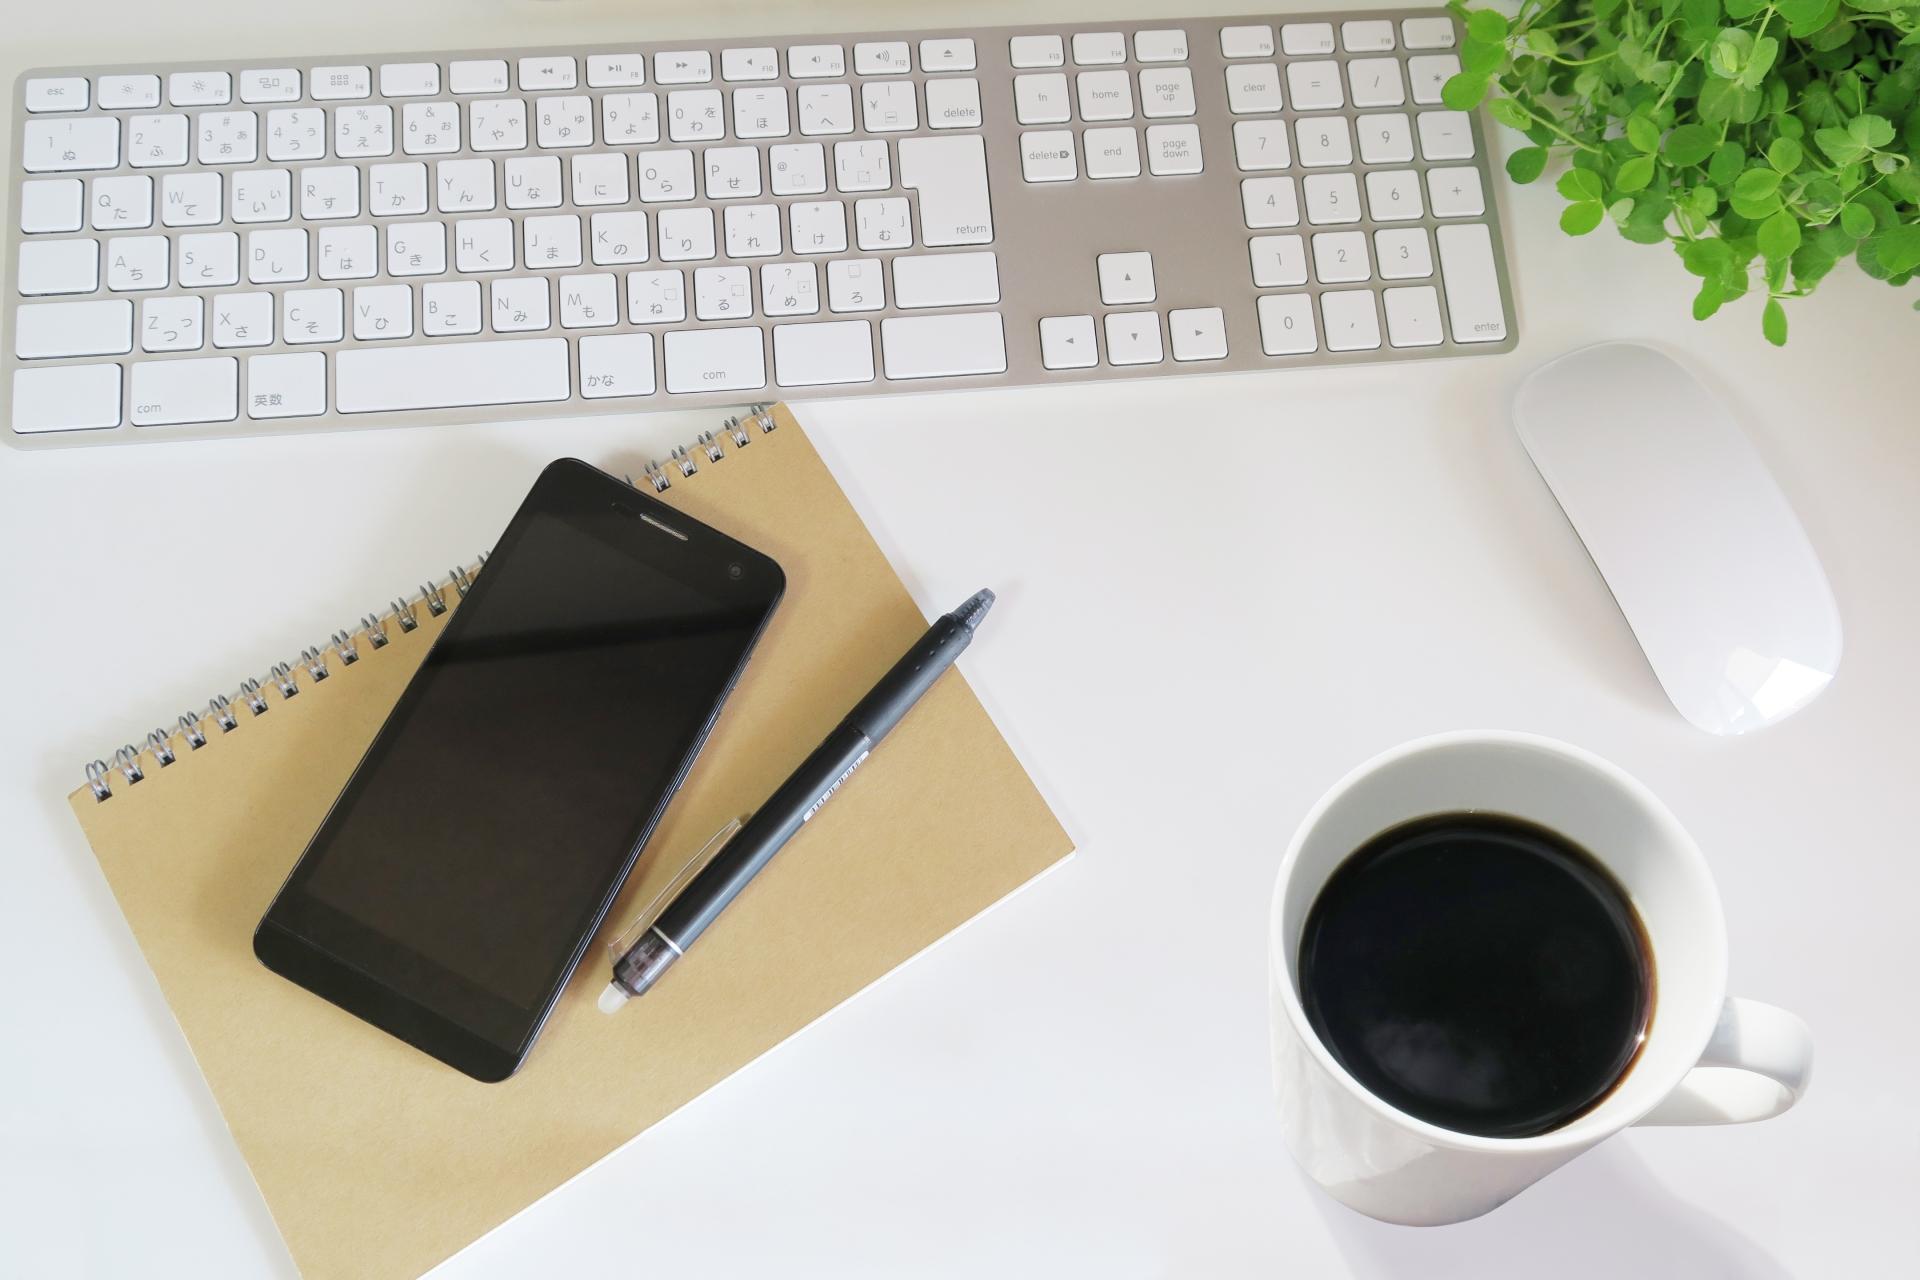 .jpg - 仕事のストレス解消!オフィスで使える癒しグッズ3選